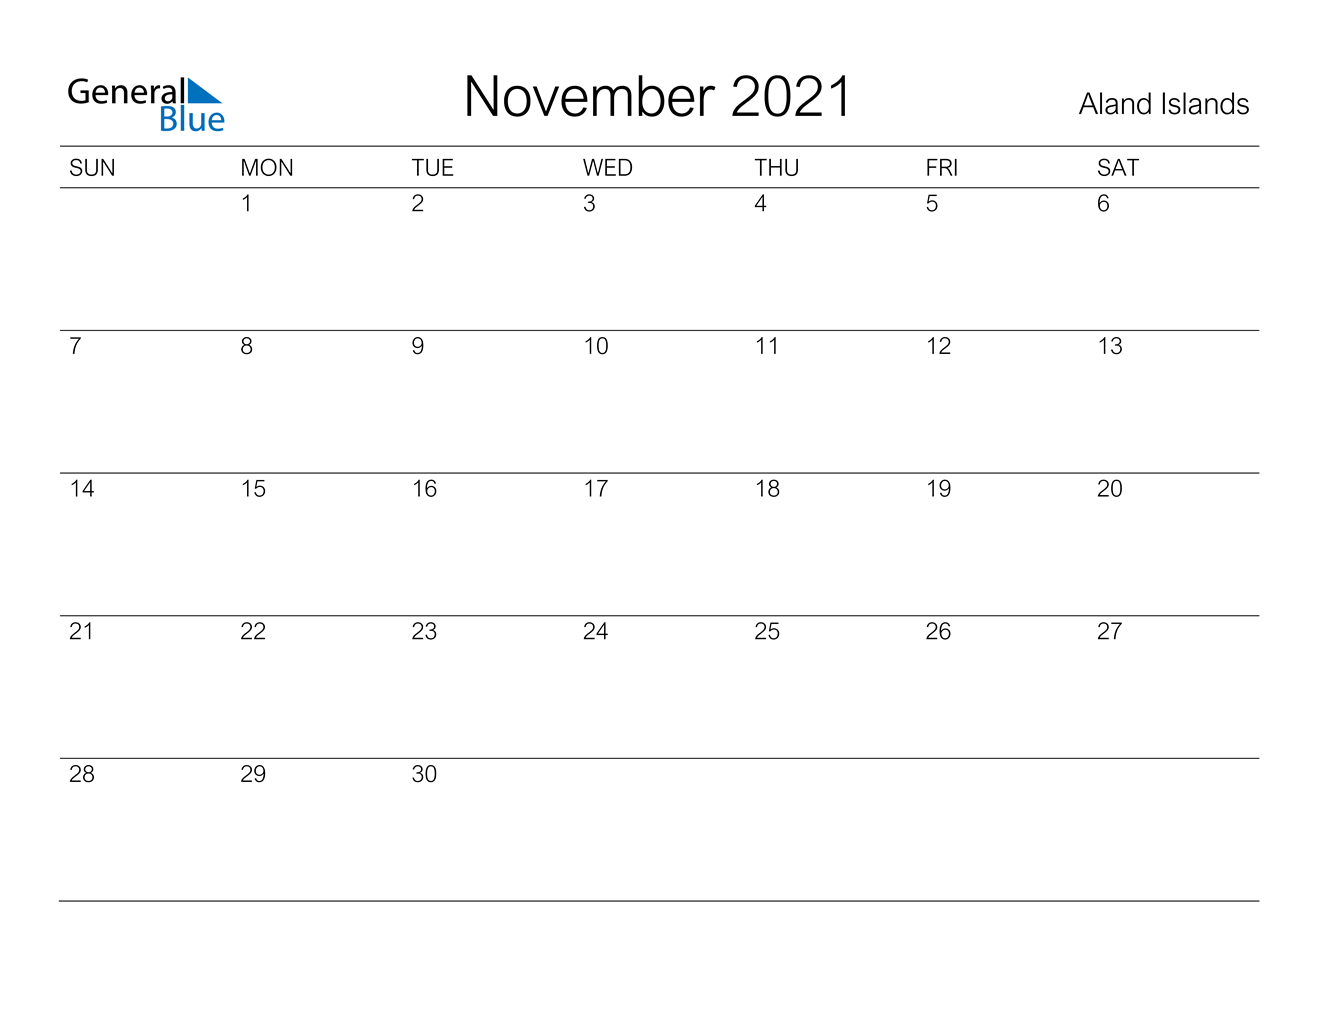 November 2021 Calendar - Aland Islands